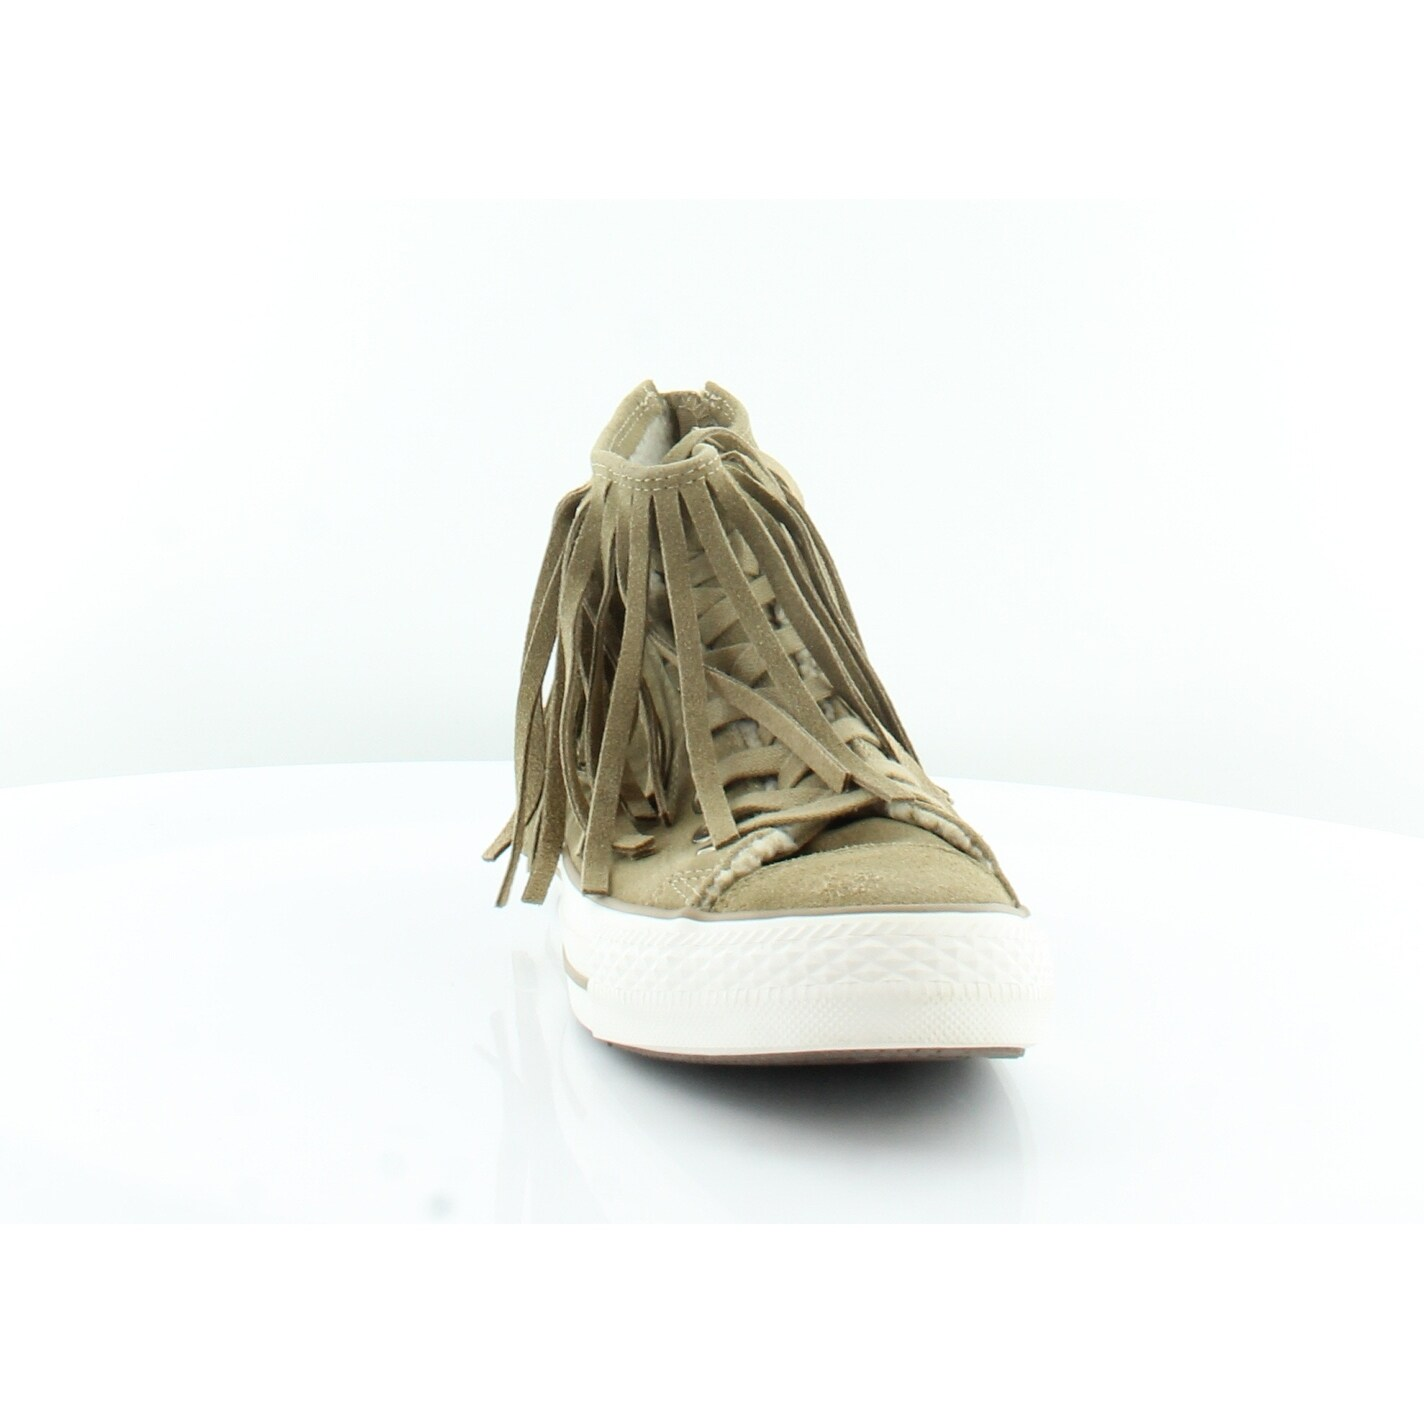 Shop Converse Fringe Women's Fashion Sneakers Sand Dune 8